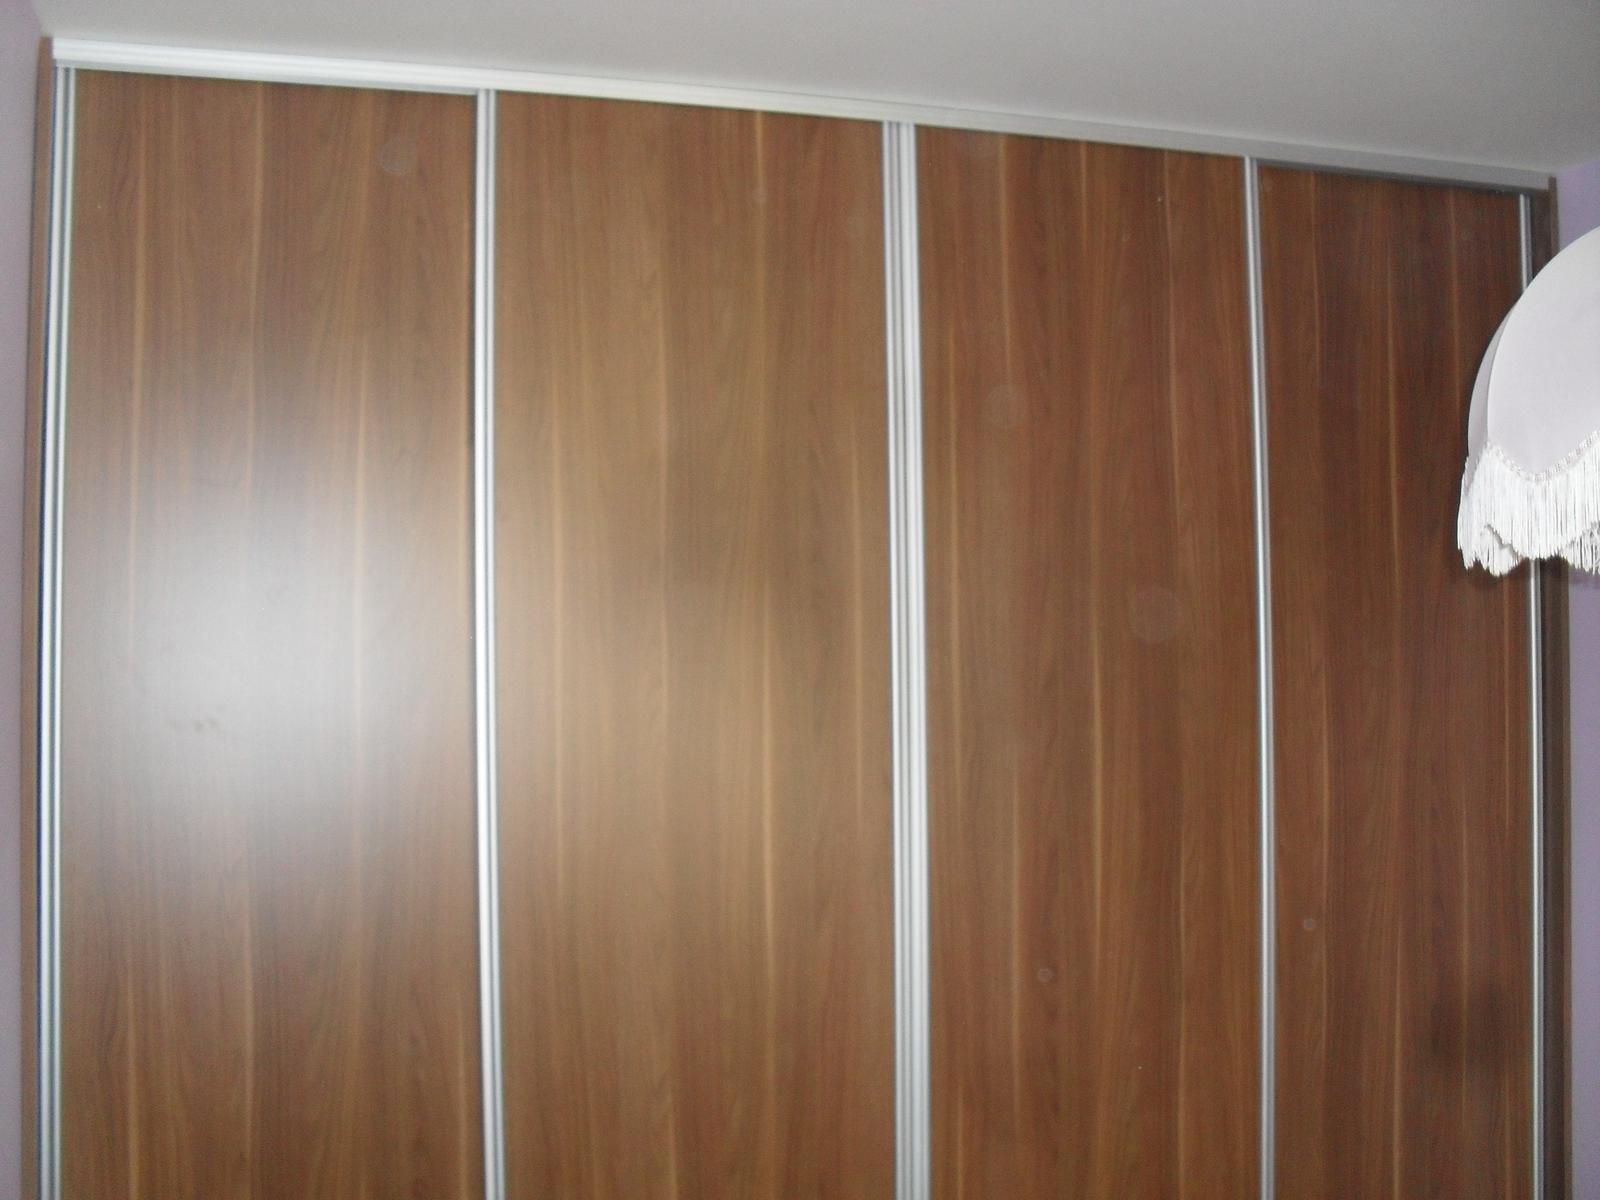 Vstavané skrine Martin Benko Bošany - Obrázok č. 91